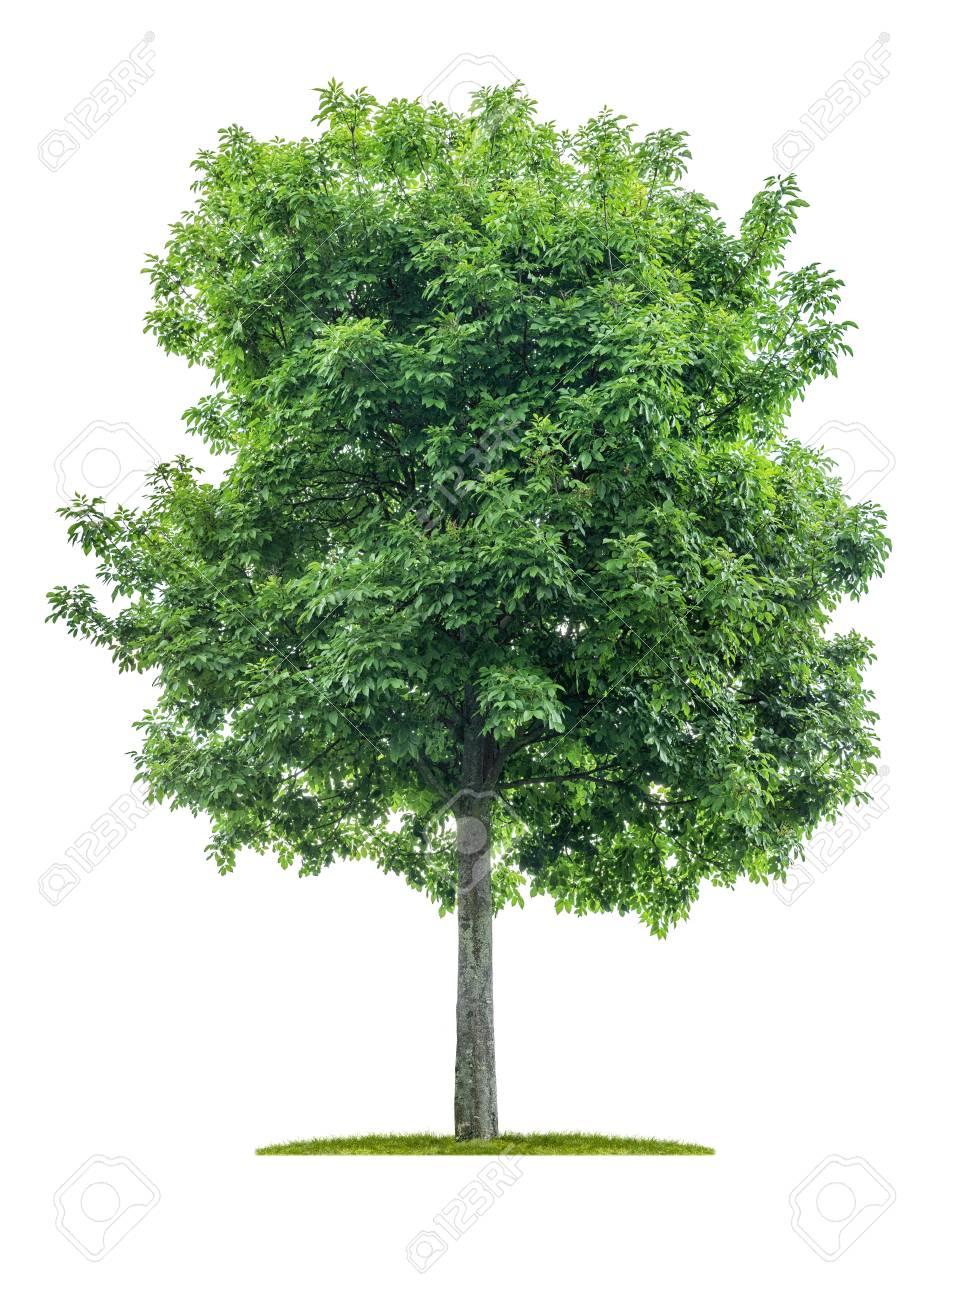 Isolated tree on a white background - Acer negundo - Maple ash - 125517159